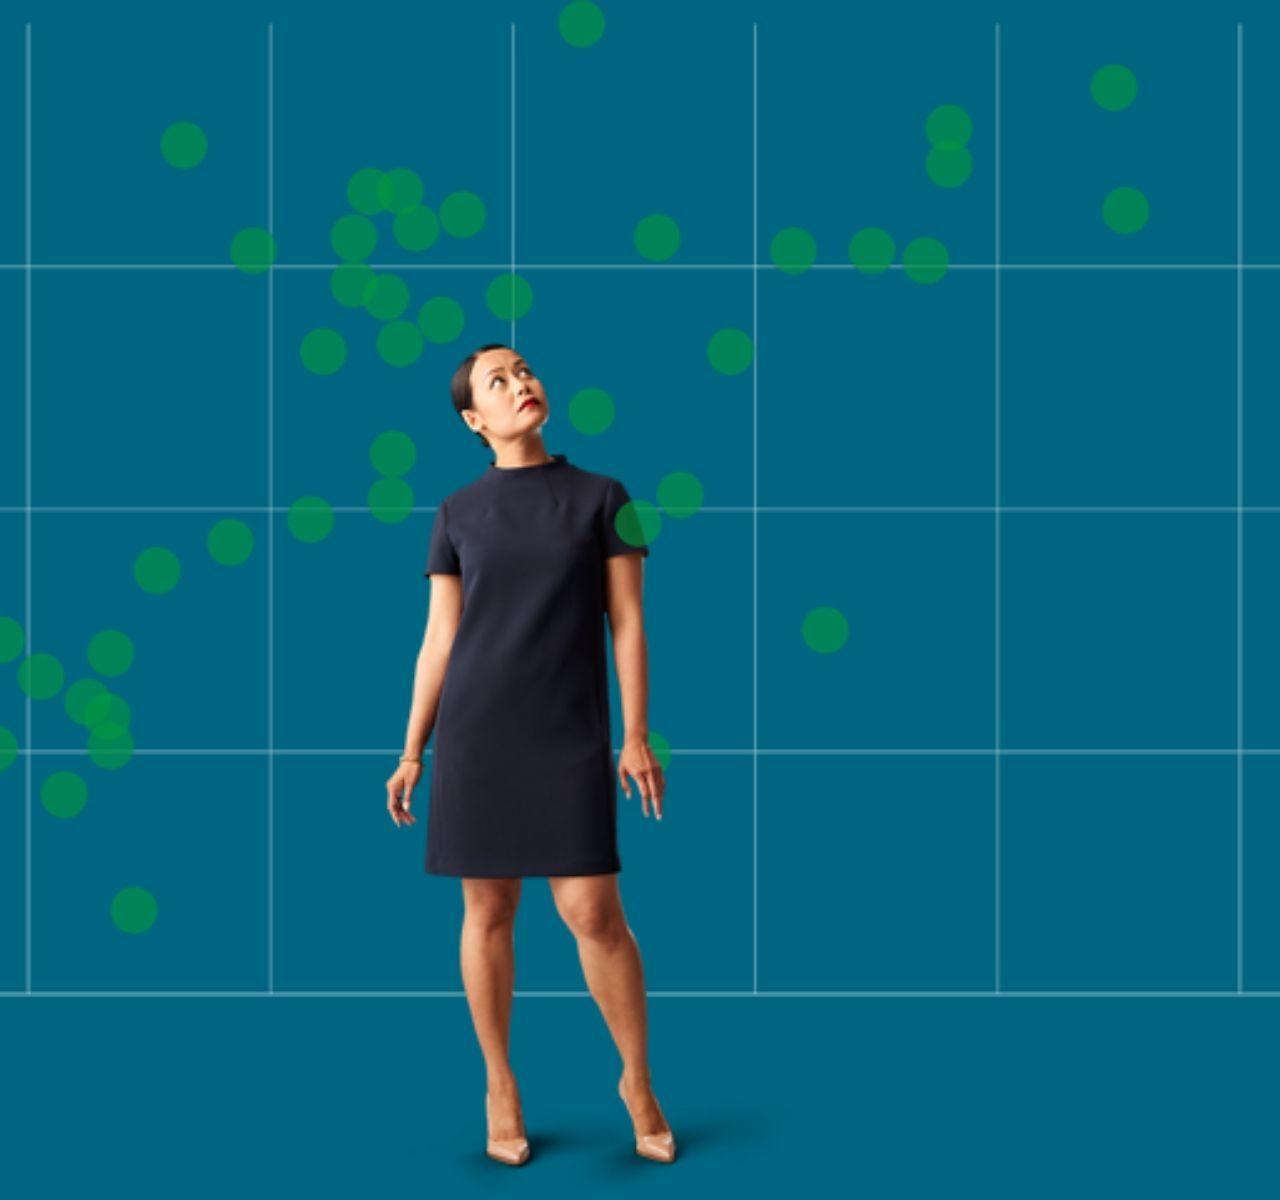 Qlik data analytics and visualization